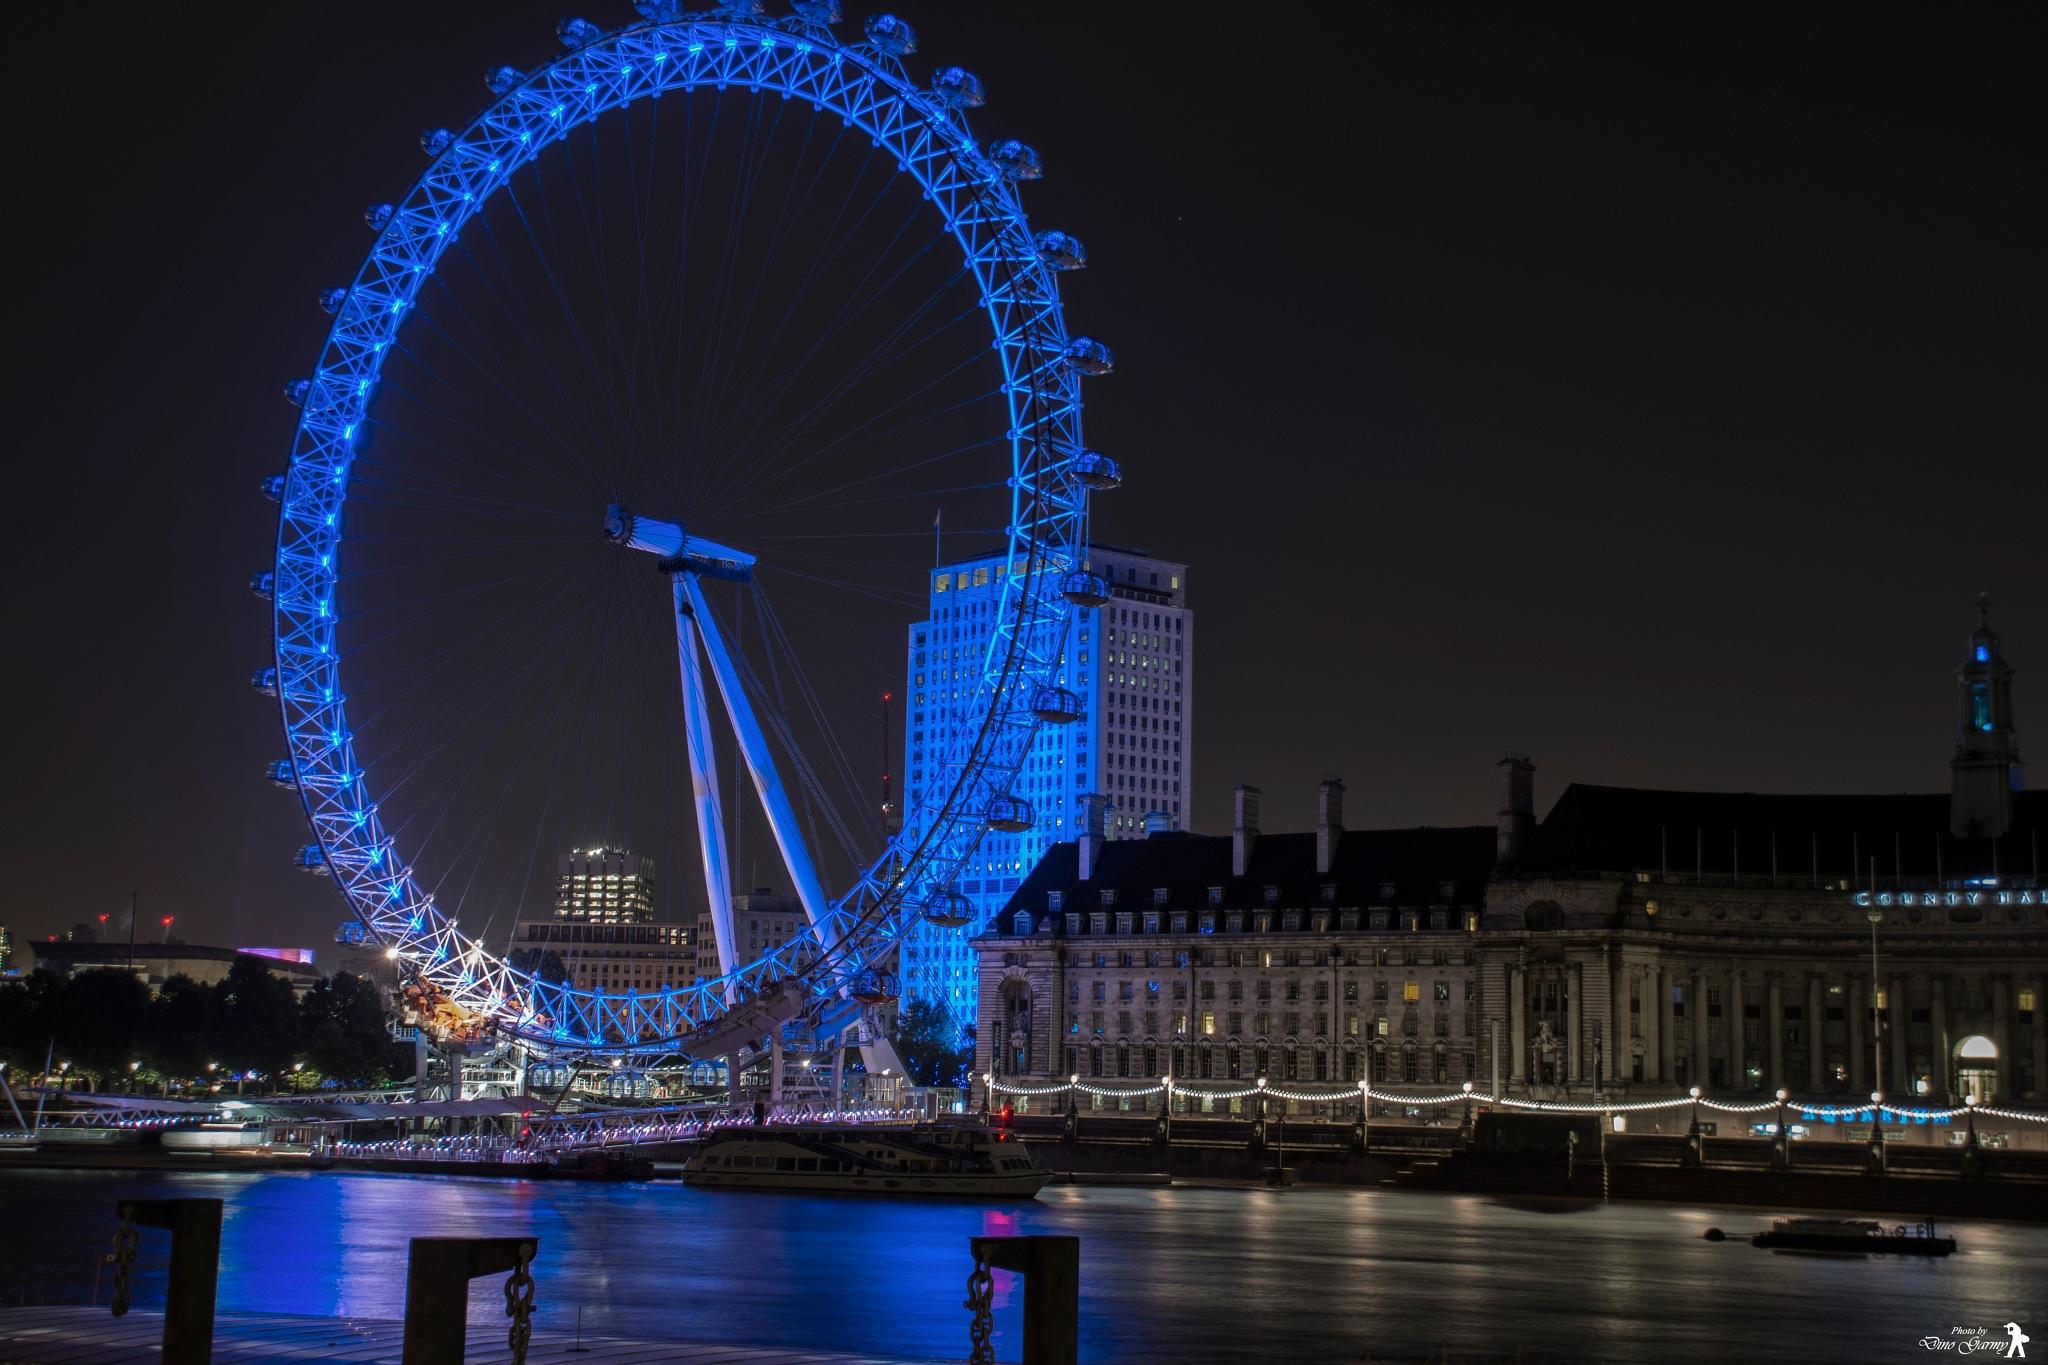 London eye by Dino